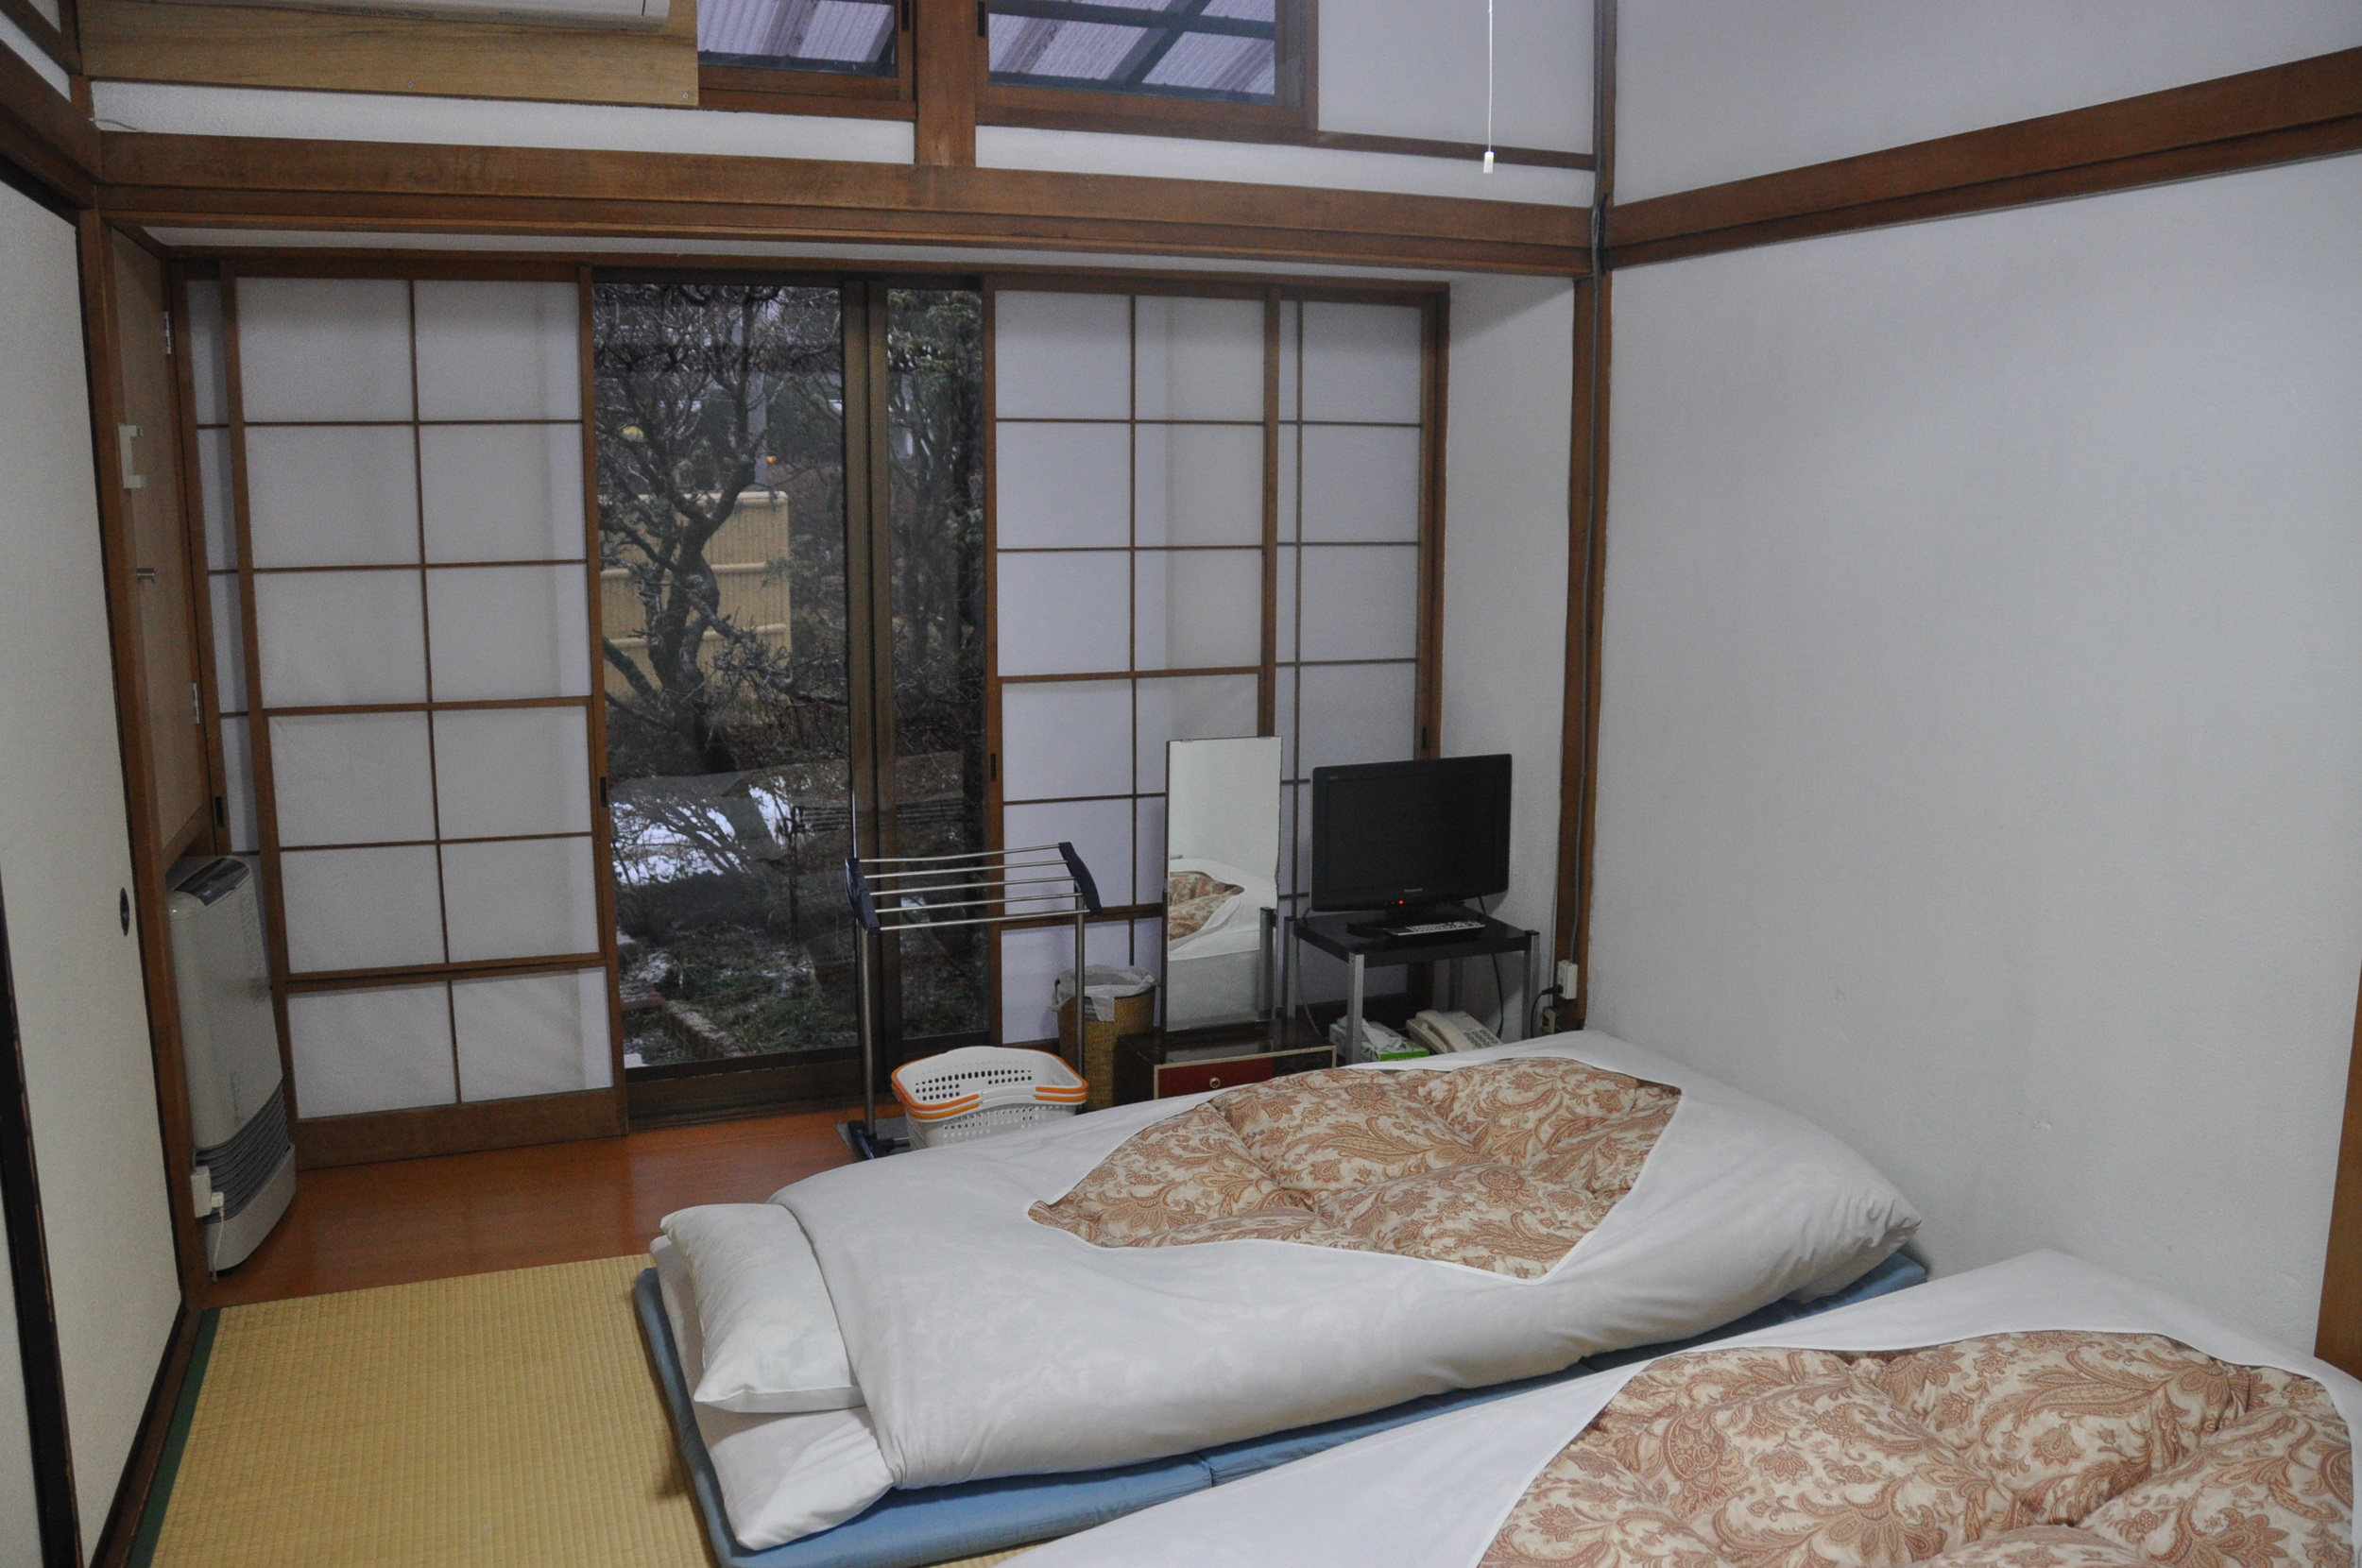 Japan fuji-Hakone Guest House Ryokan style